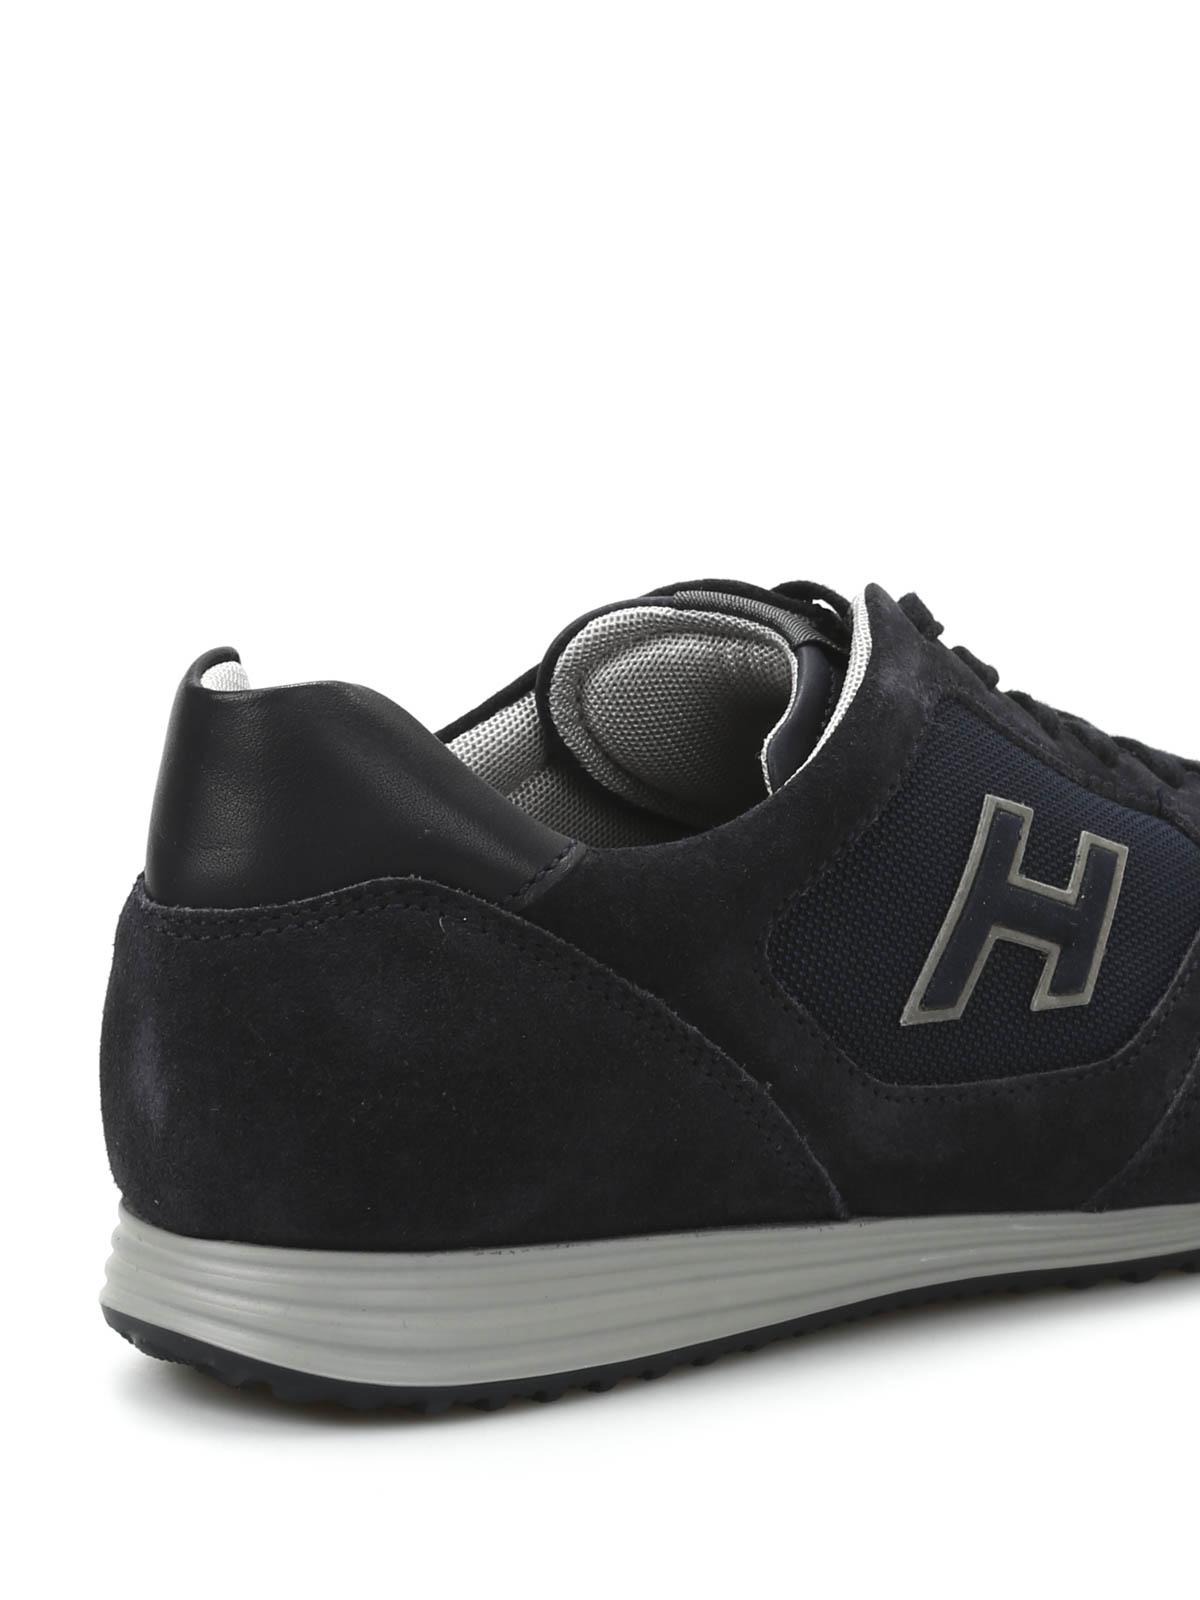 Trainers Hogan - Olympia X H205 sneakers - HXM2050U6708CW2264 ...